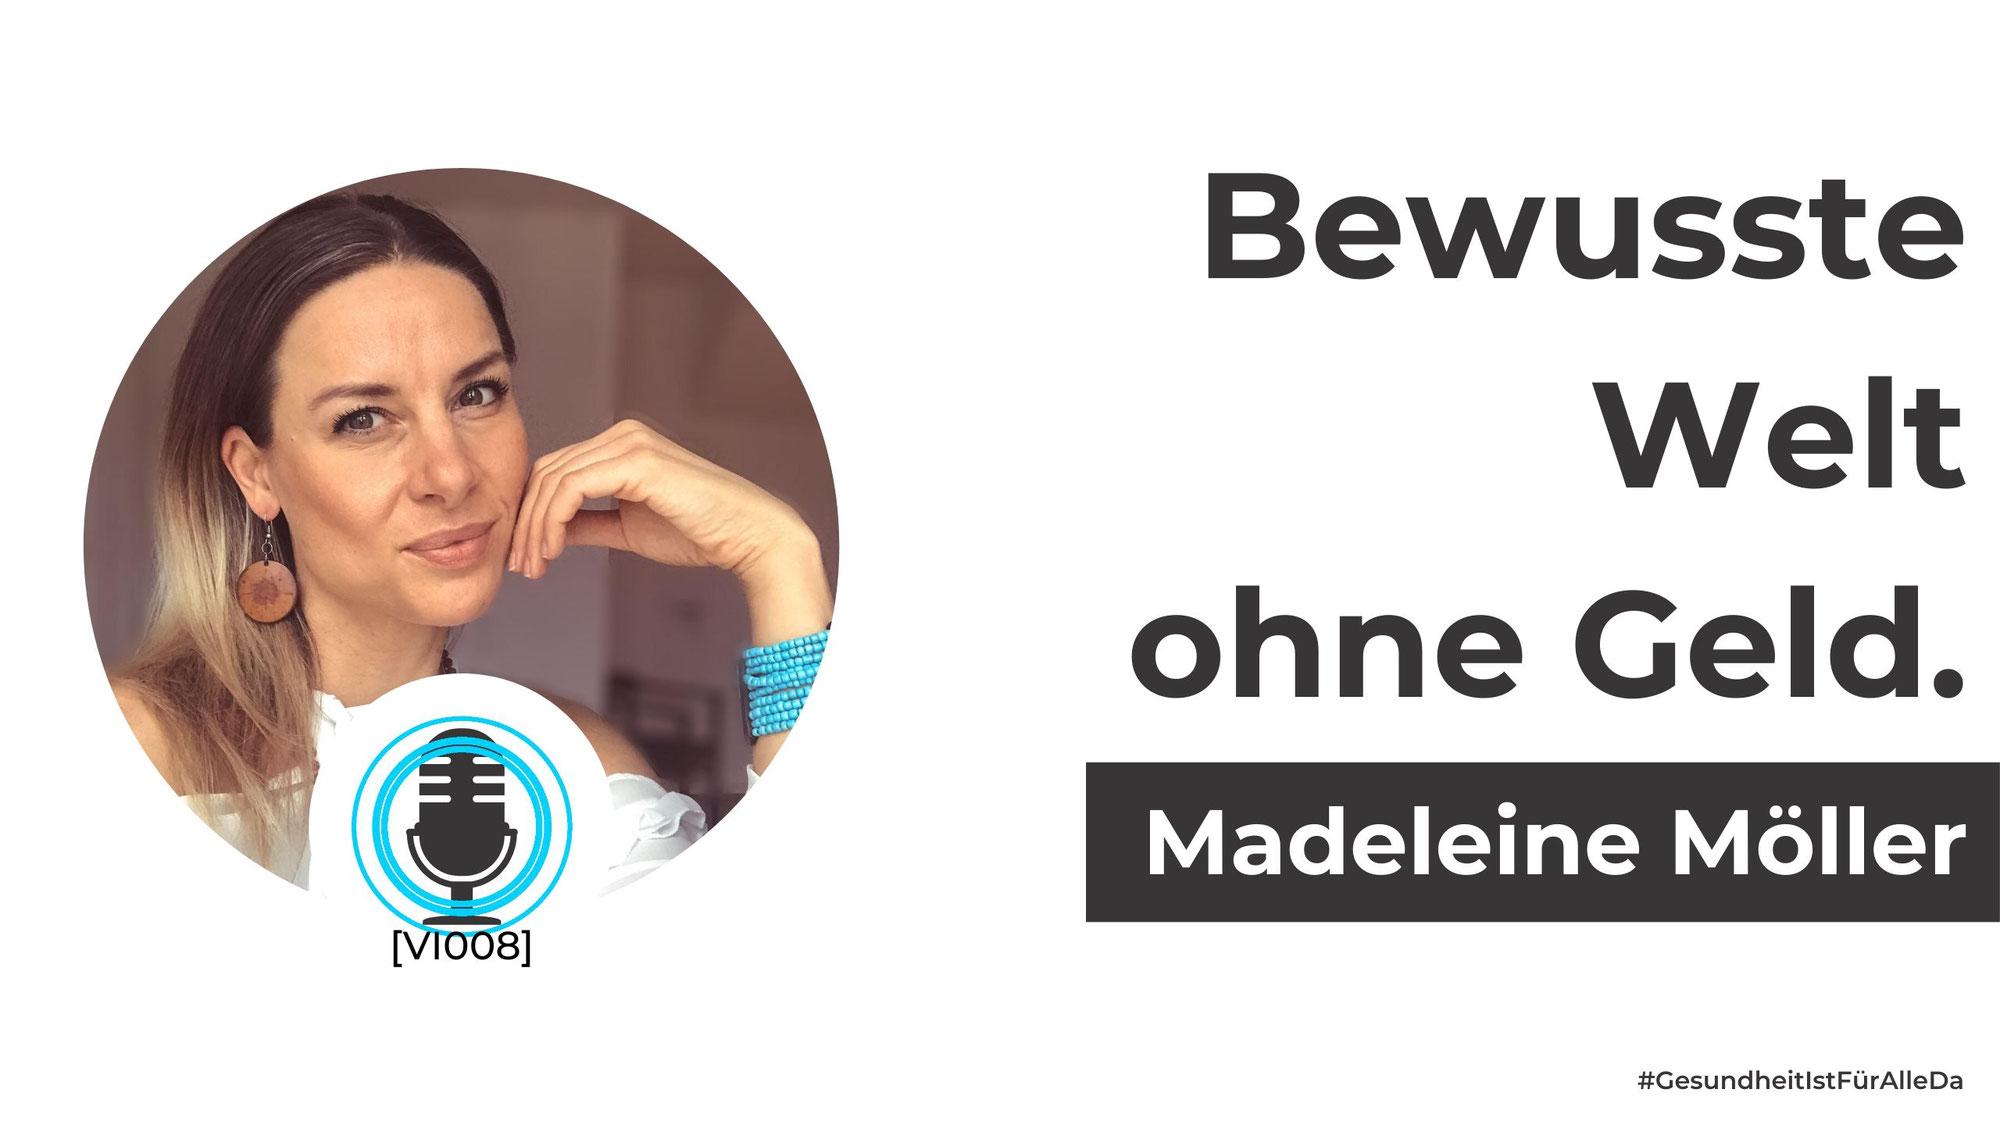 Madeleine Möller